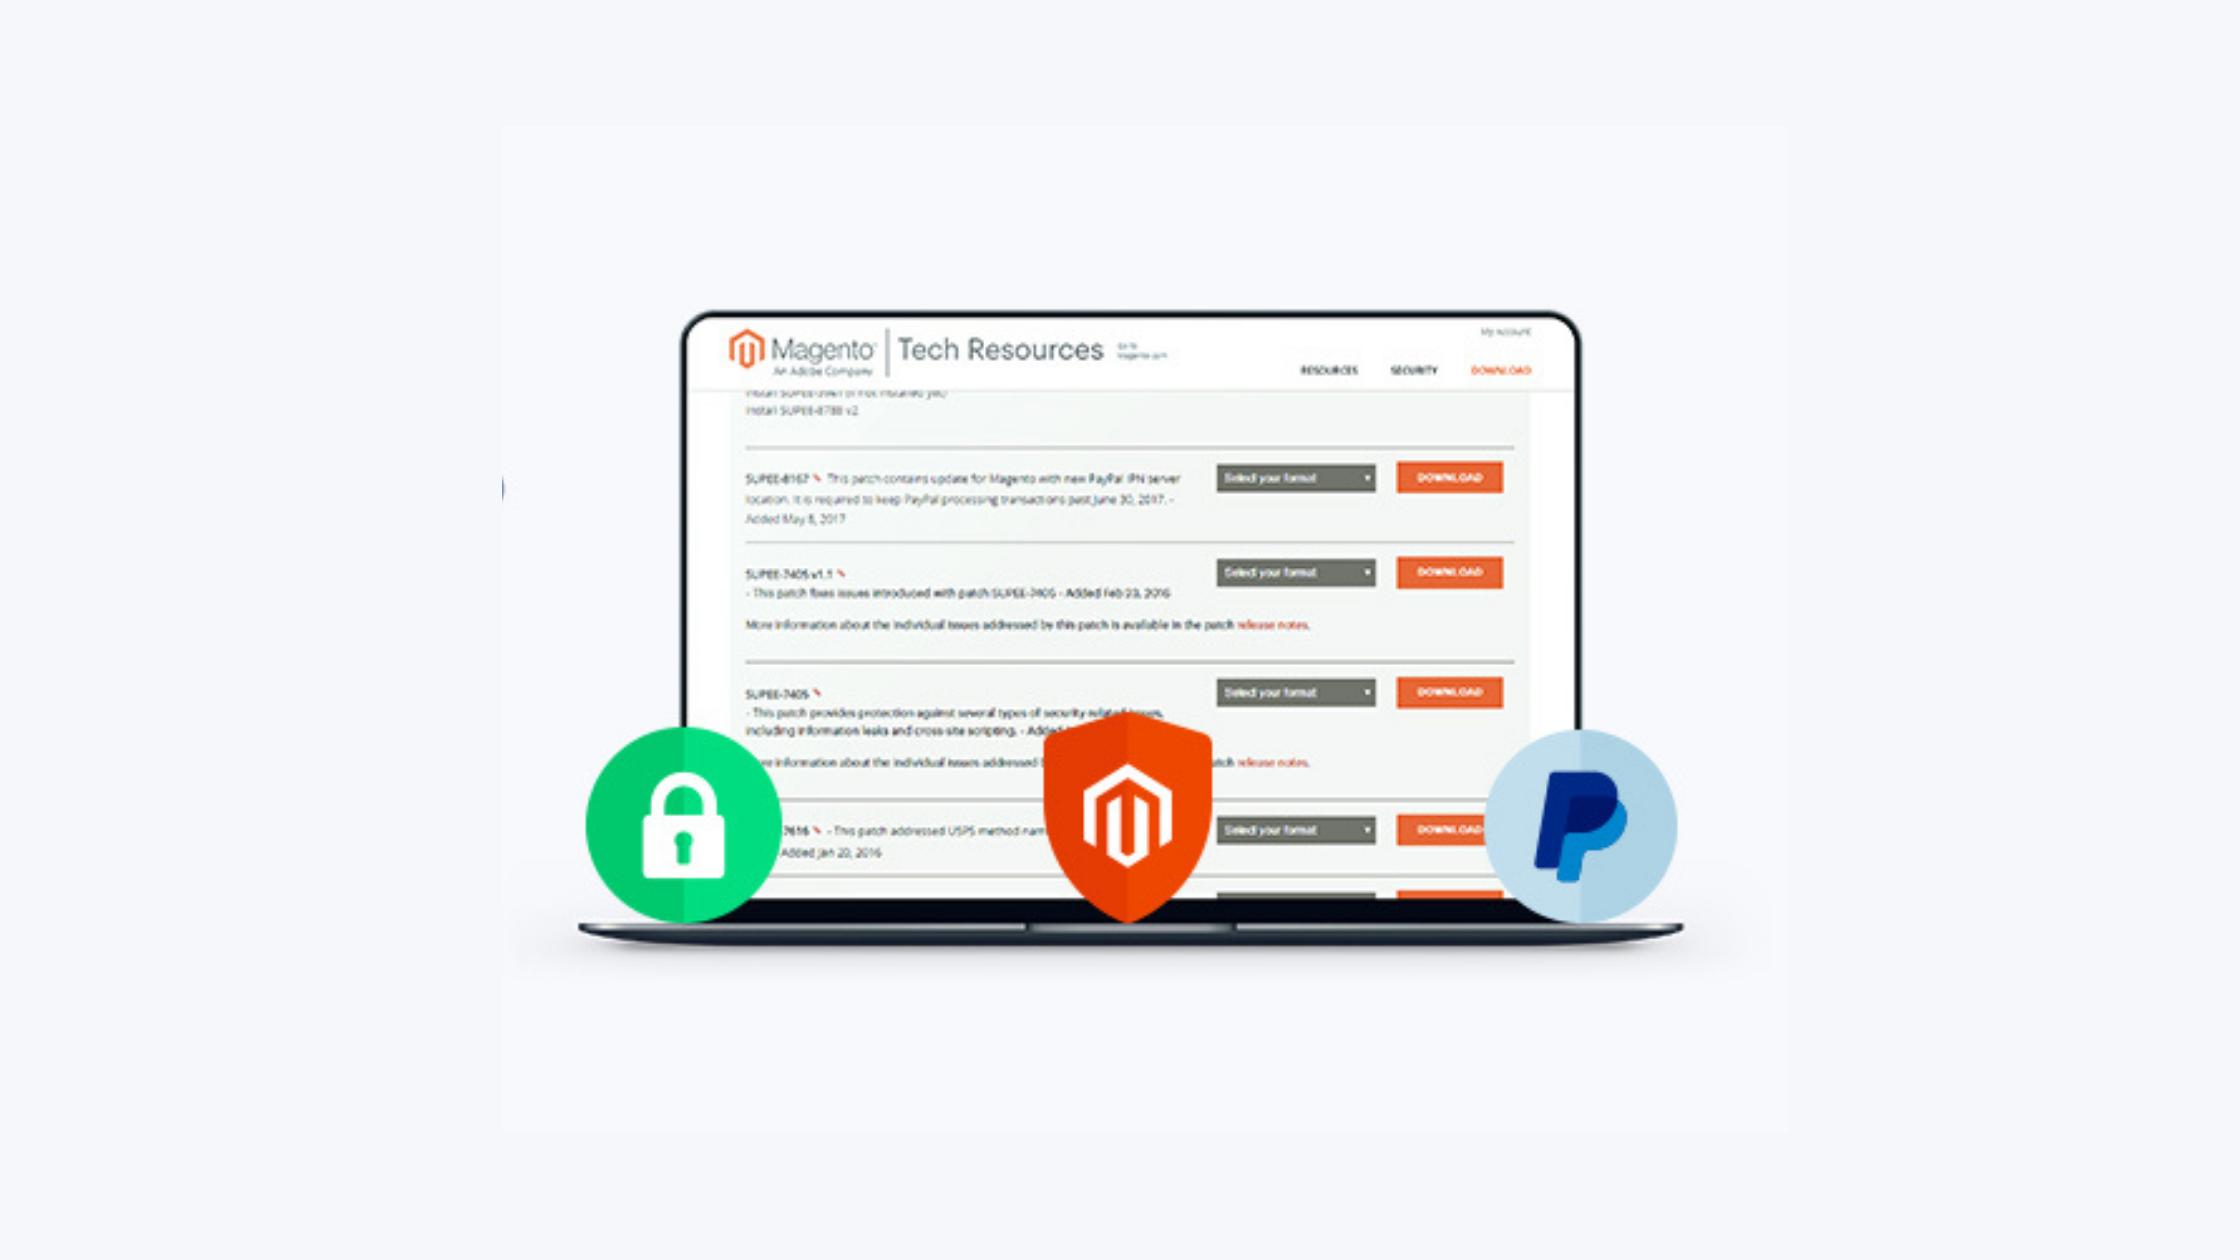 Apply SUPEE-8167 – Latest PayPal IPN Upgrade Notification for Magento Merchants